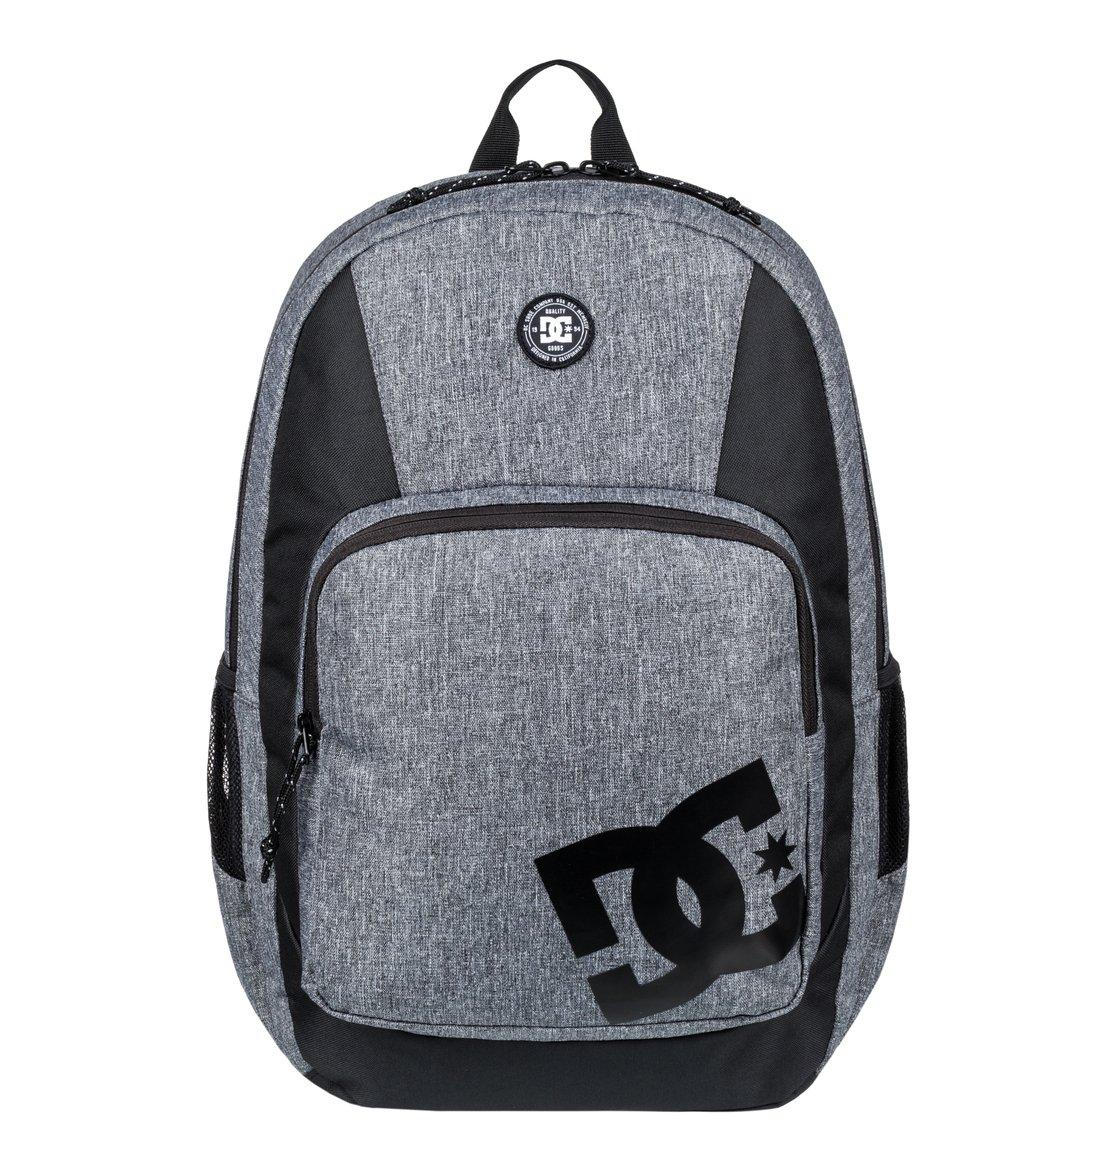 ff8fb834ab 0 23L The Locker Medium Backpack EDYBP03158 DC Shoes